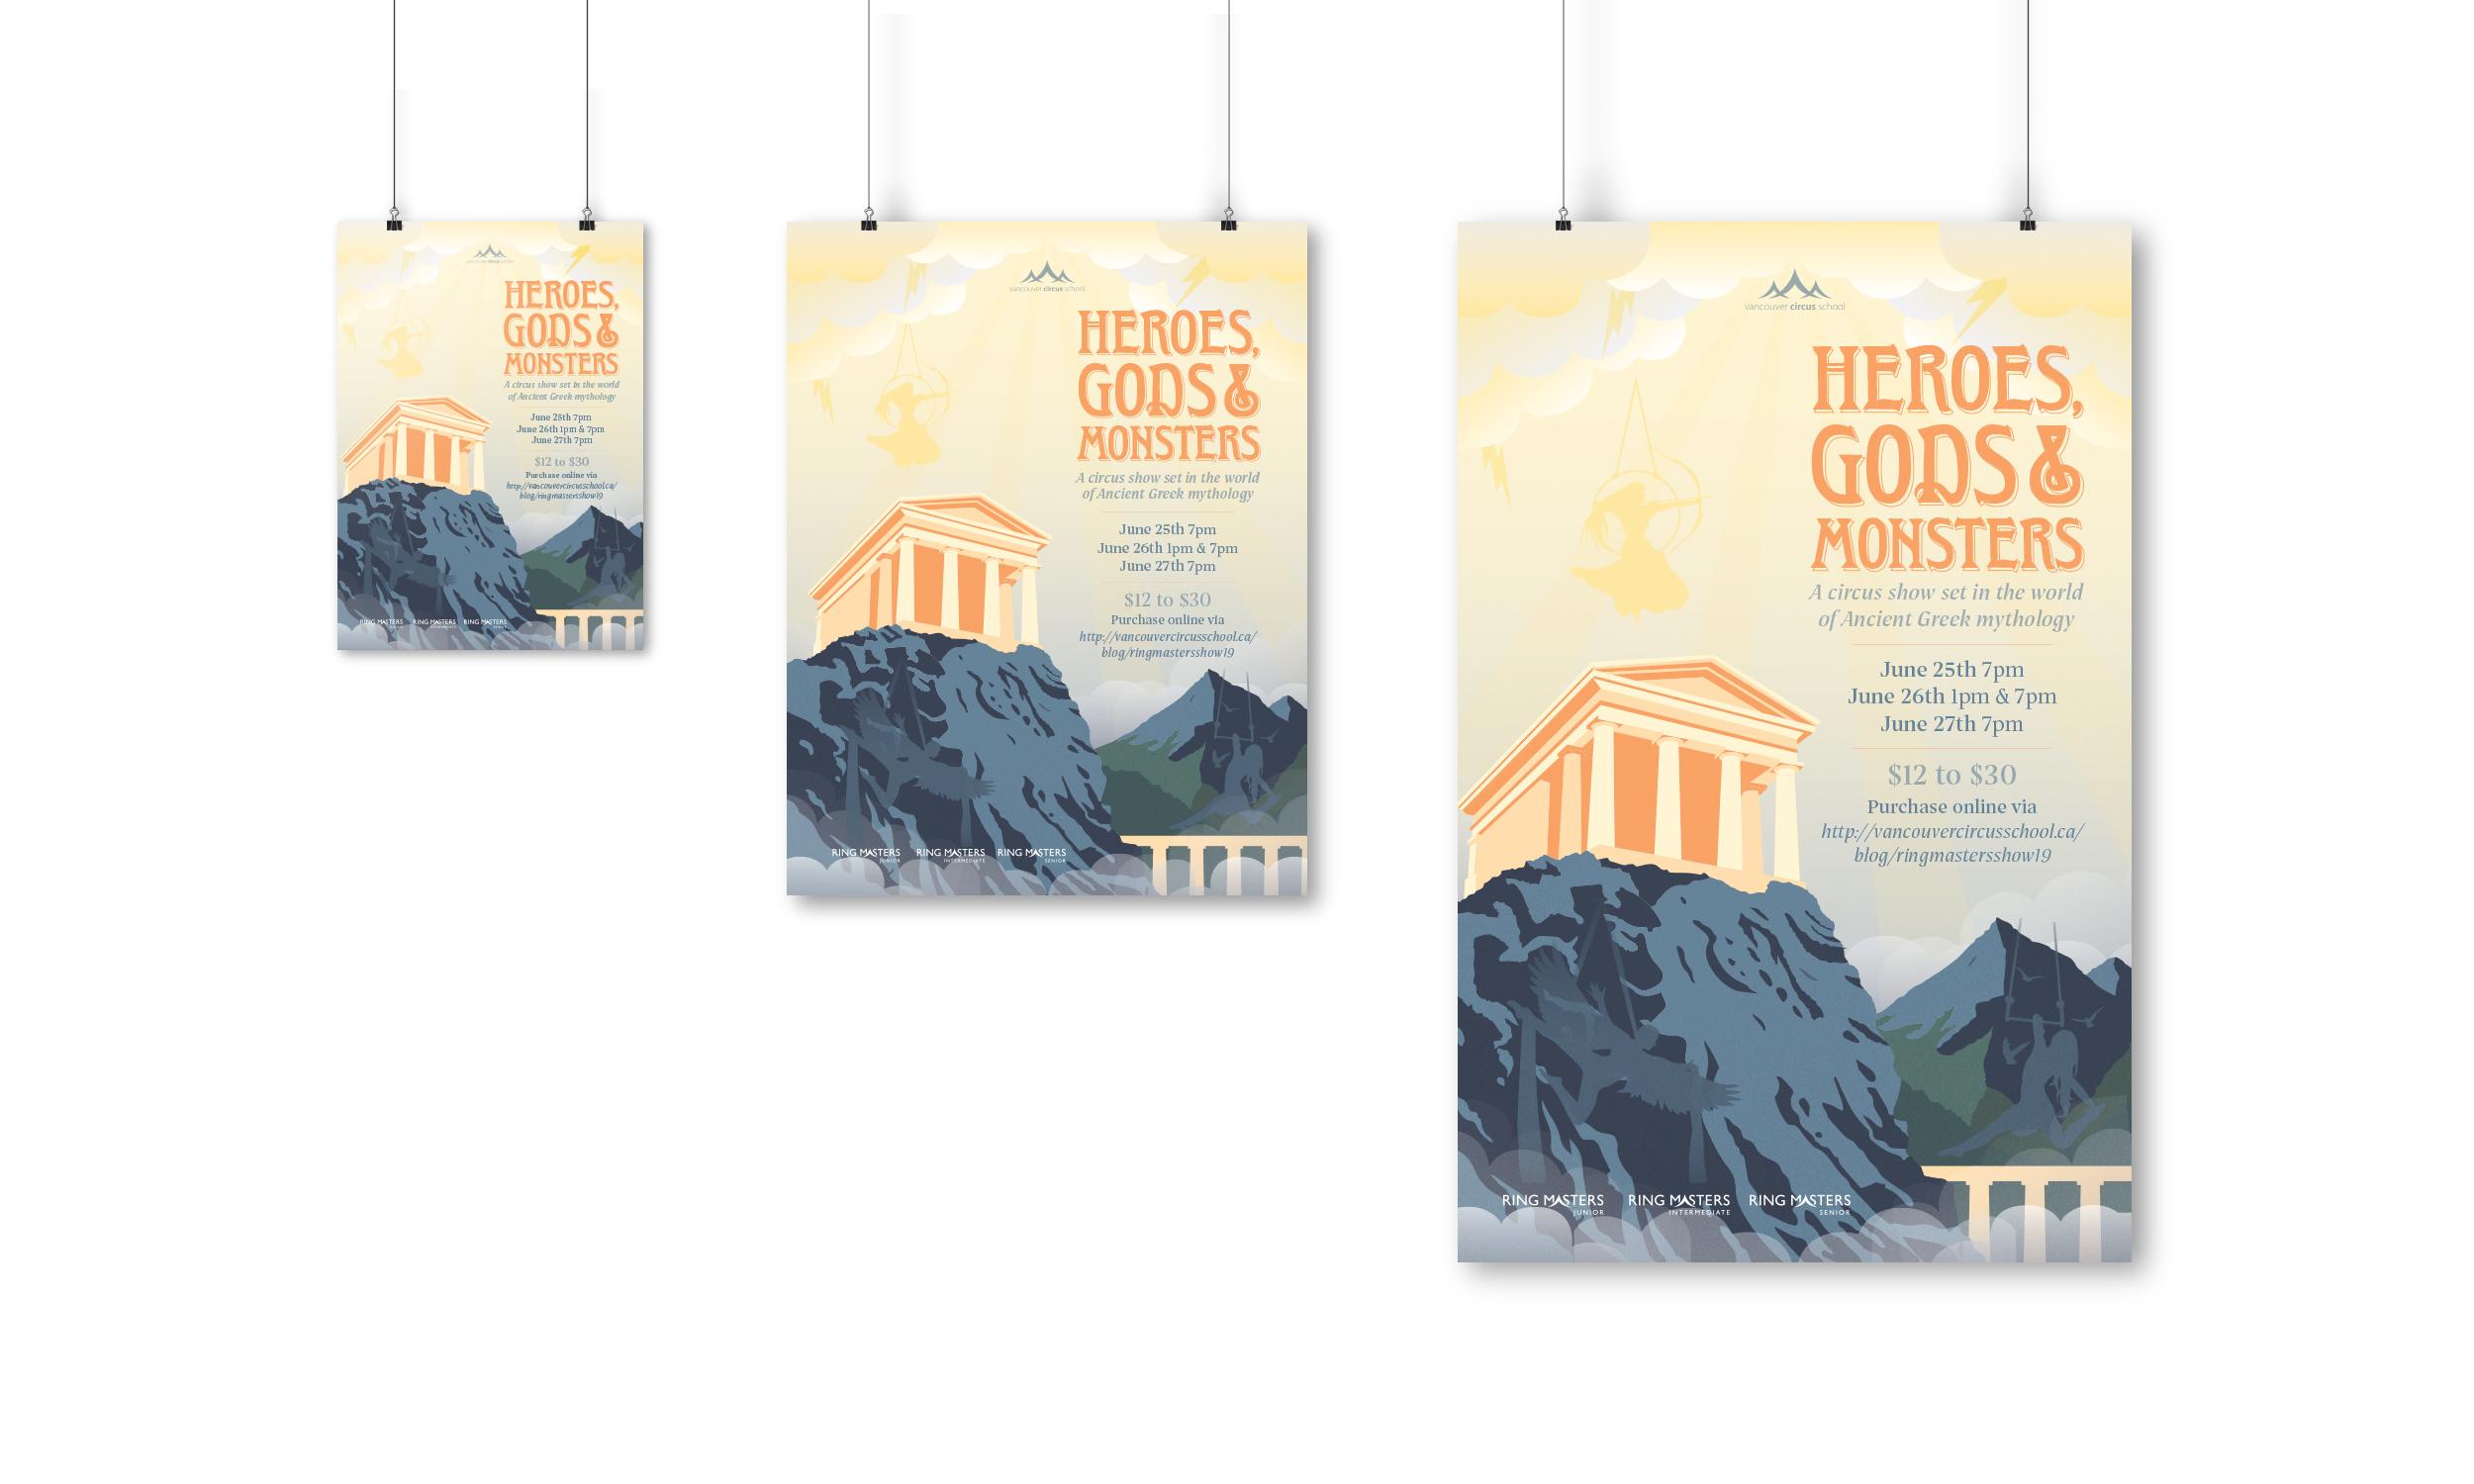 HEROES, GODS & MONSTERS — Hillary Halldorson Designs